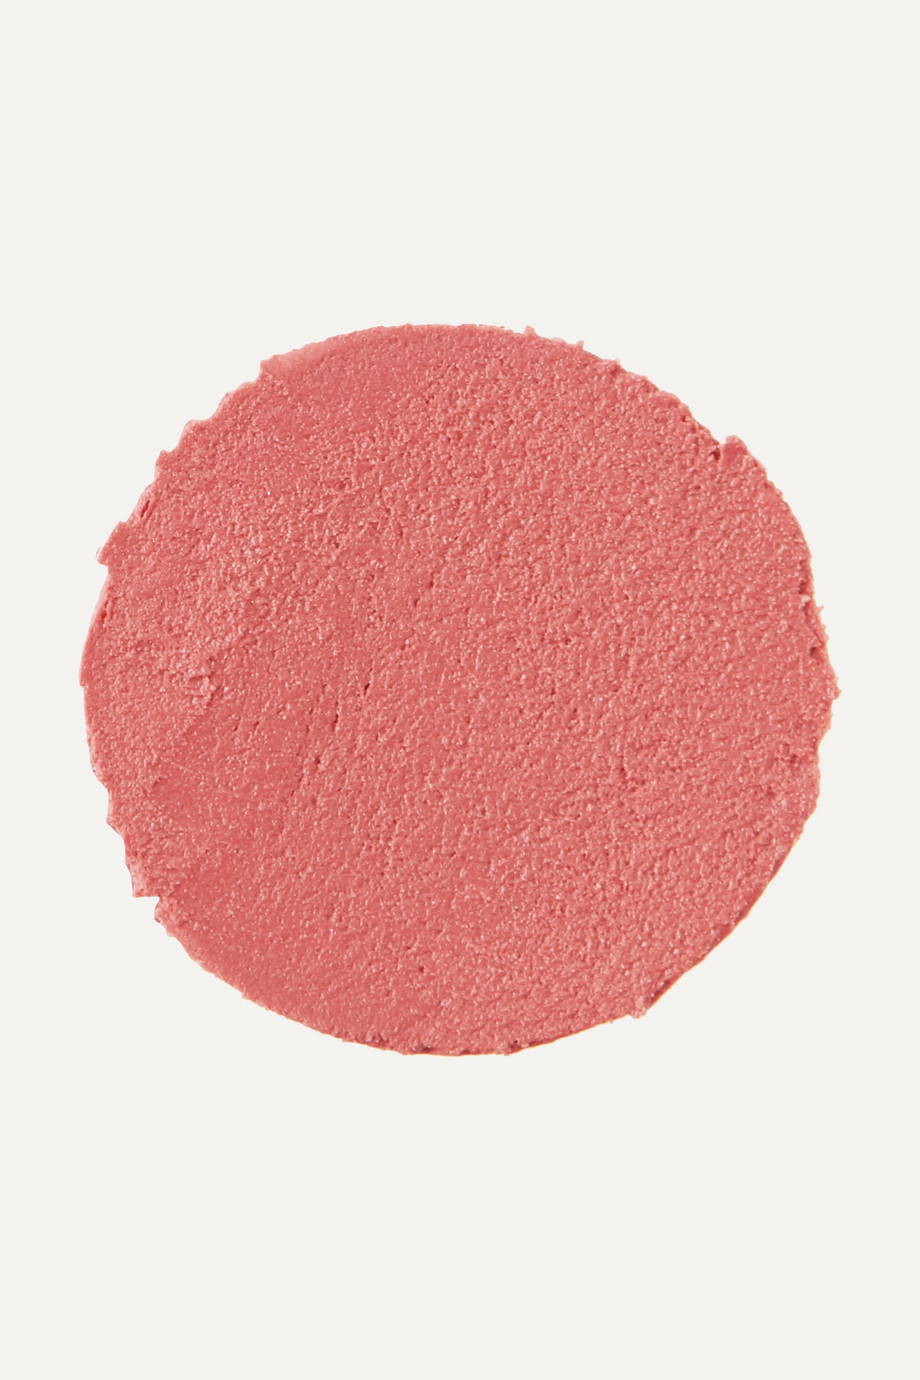 Bobbi Brown Crushed Lip Color - Angel